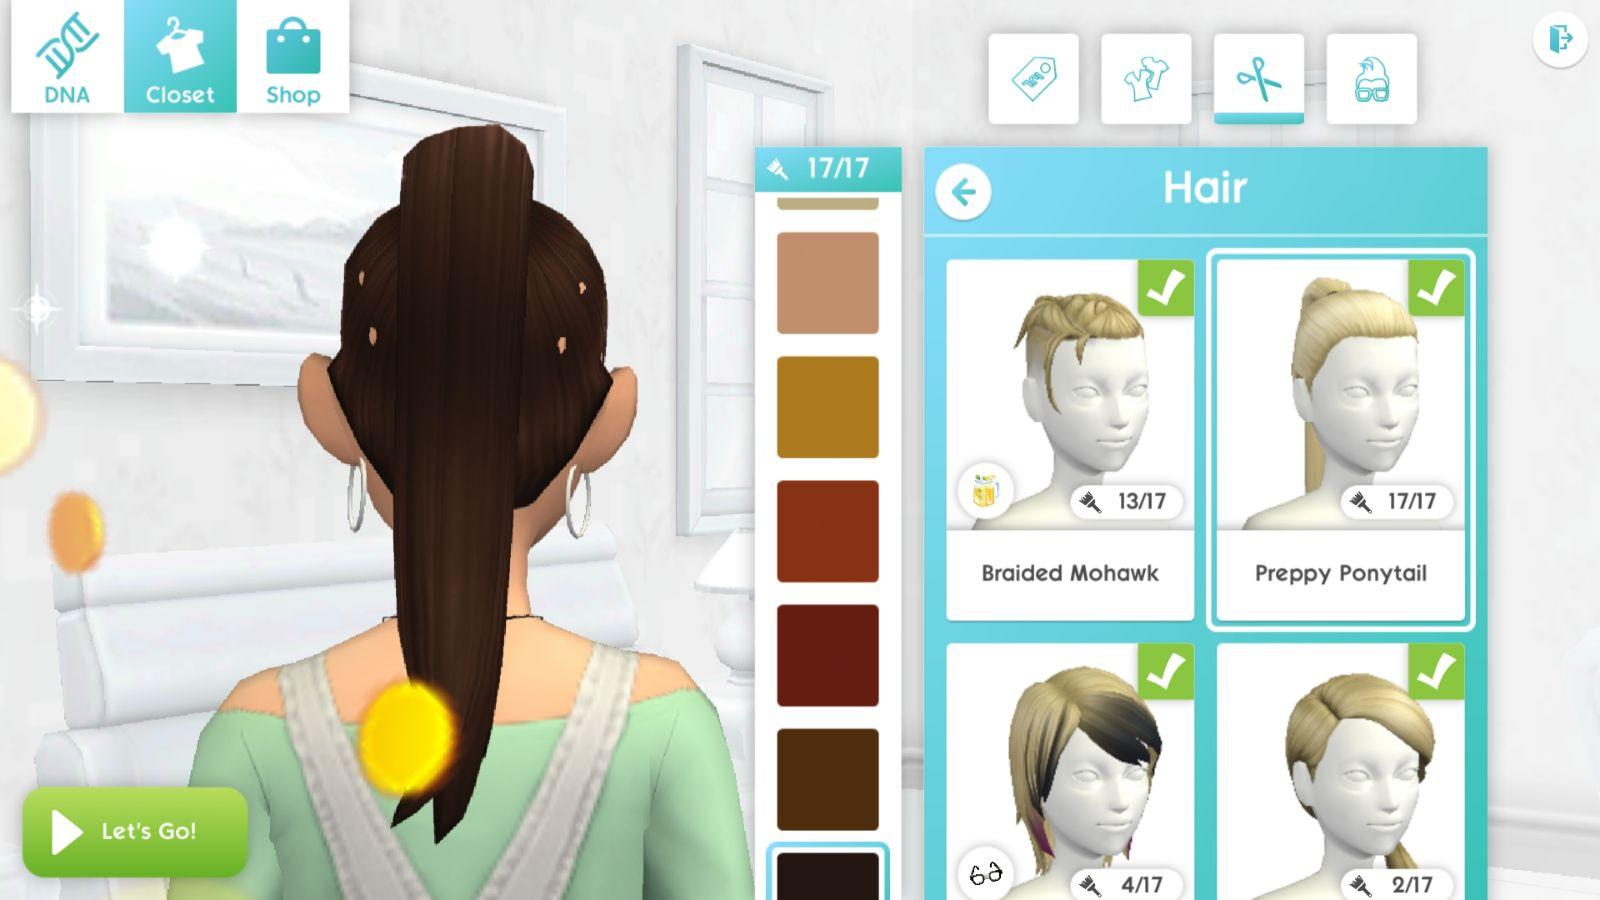 Resized_Screenshot_20190827-145529_The_Sims_3961.jpg